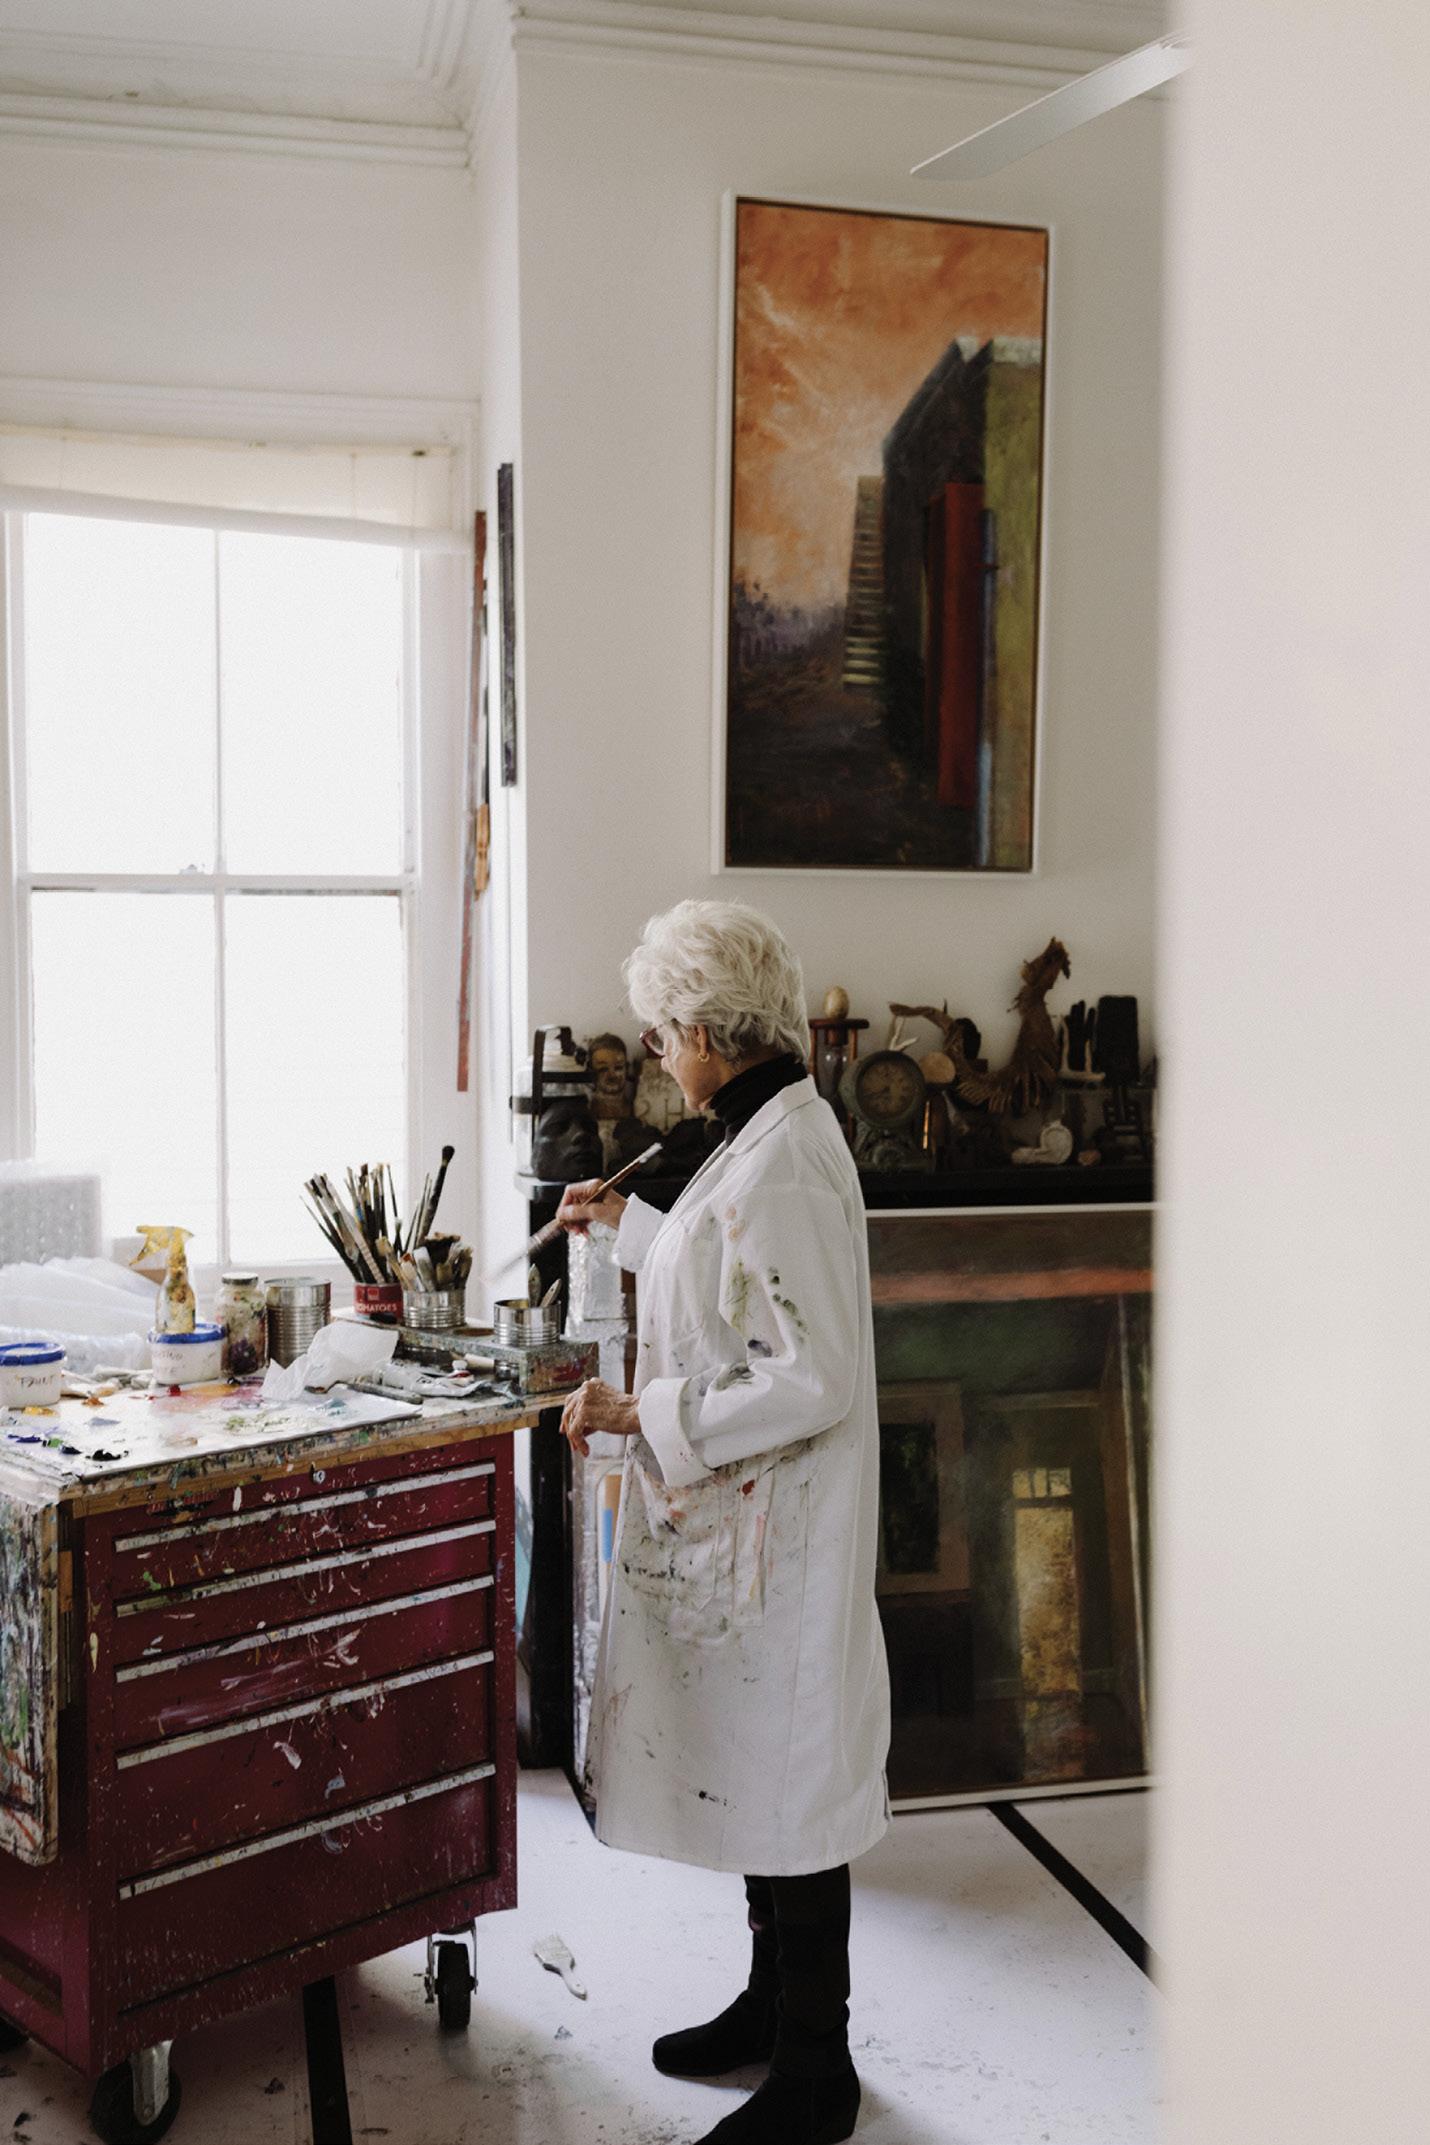 Beauty in Ruin: Fantuzzo at work in her light-filled studio